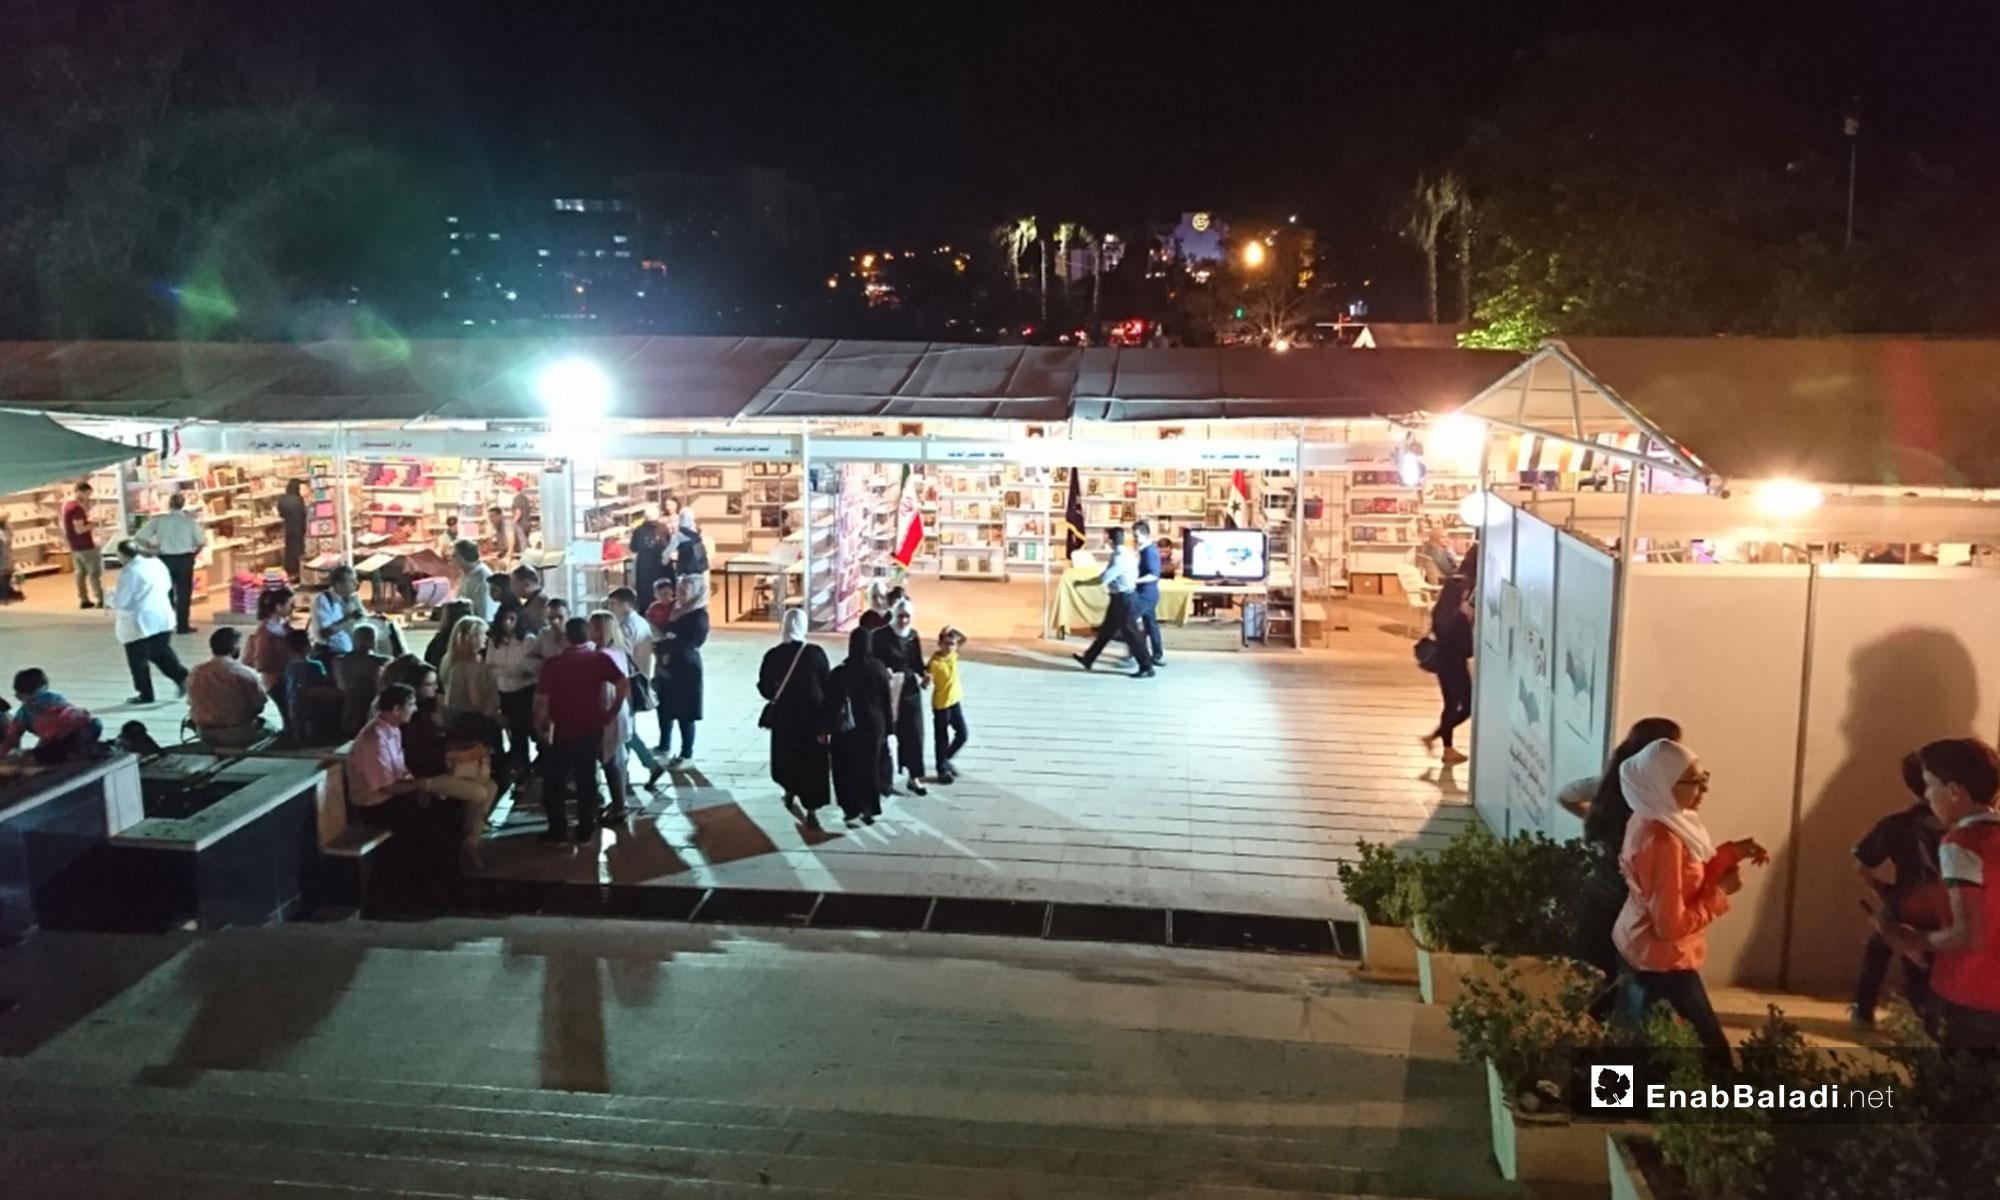 The Book Fair in Damascus - August 8, 2018 (Enab Baladi)